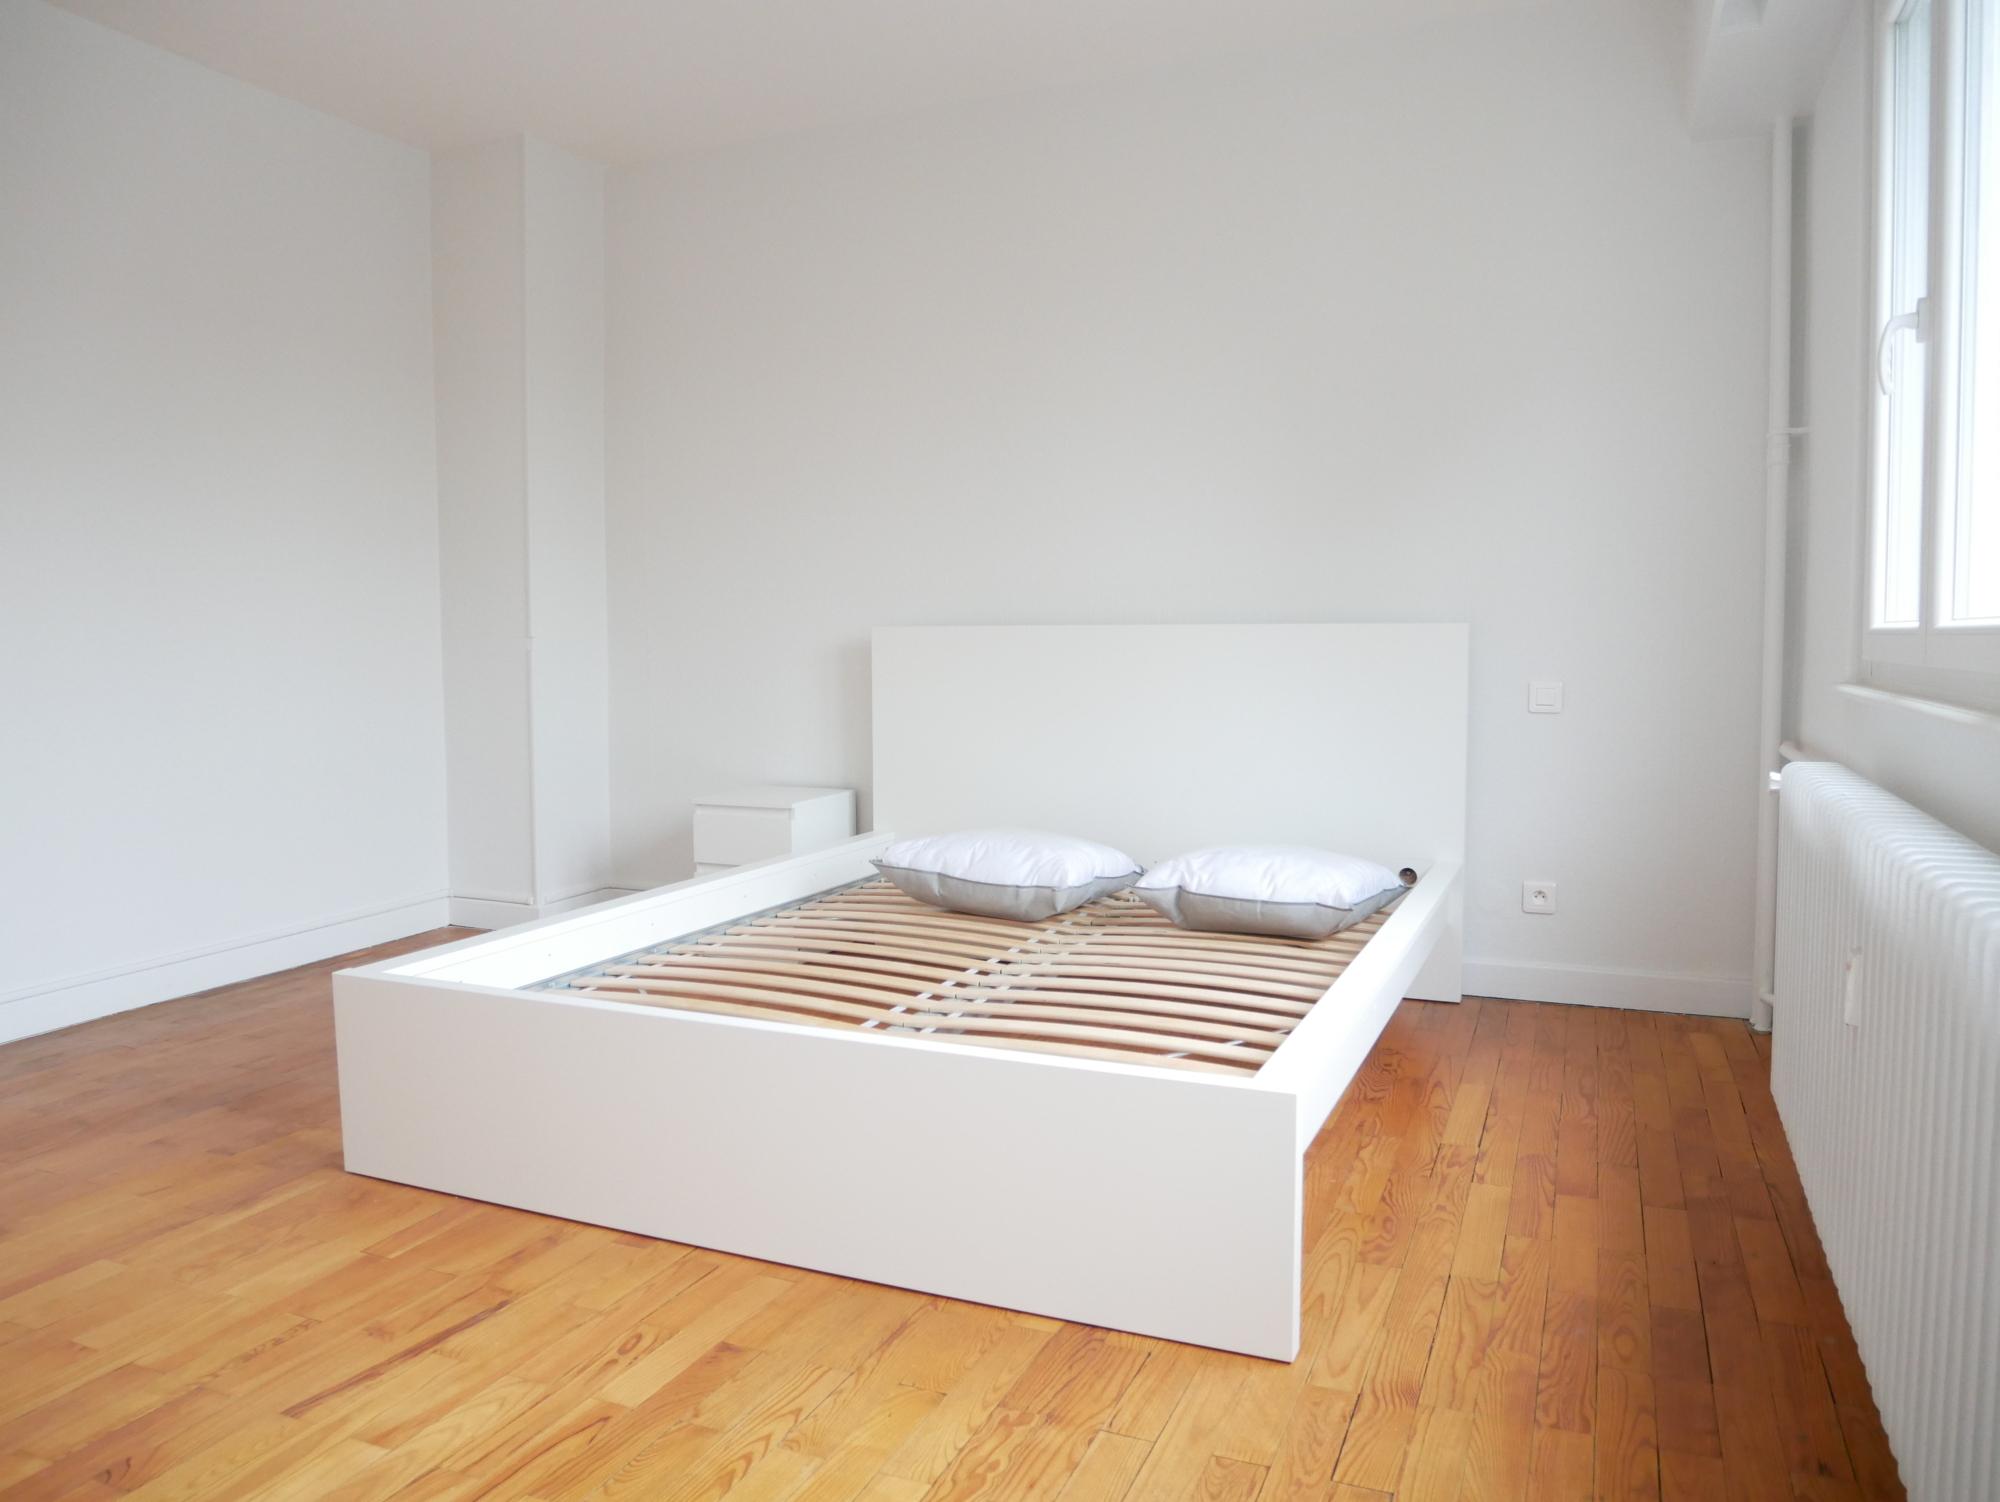 Lumineux appartement 3 pièces avec balcon - Strasbourg / Neudorf - nos ventes - Beausite Immobilier 4